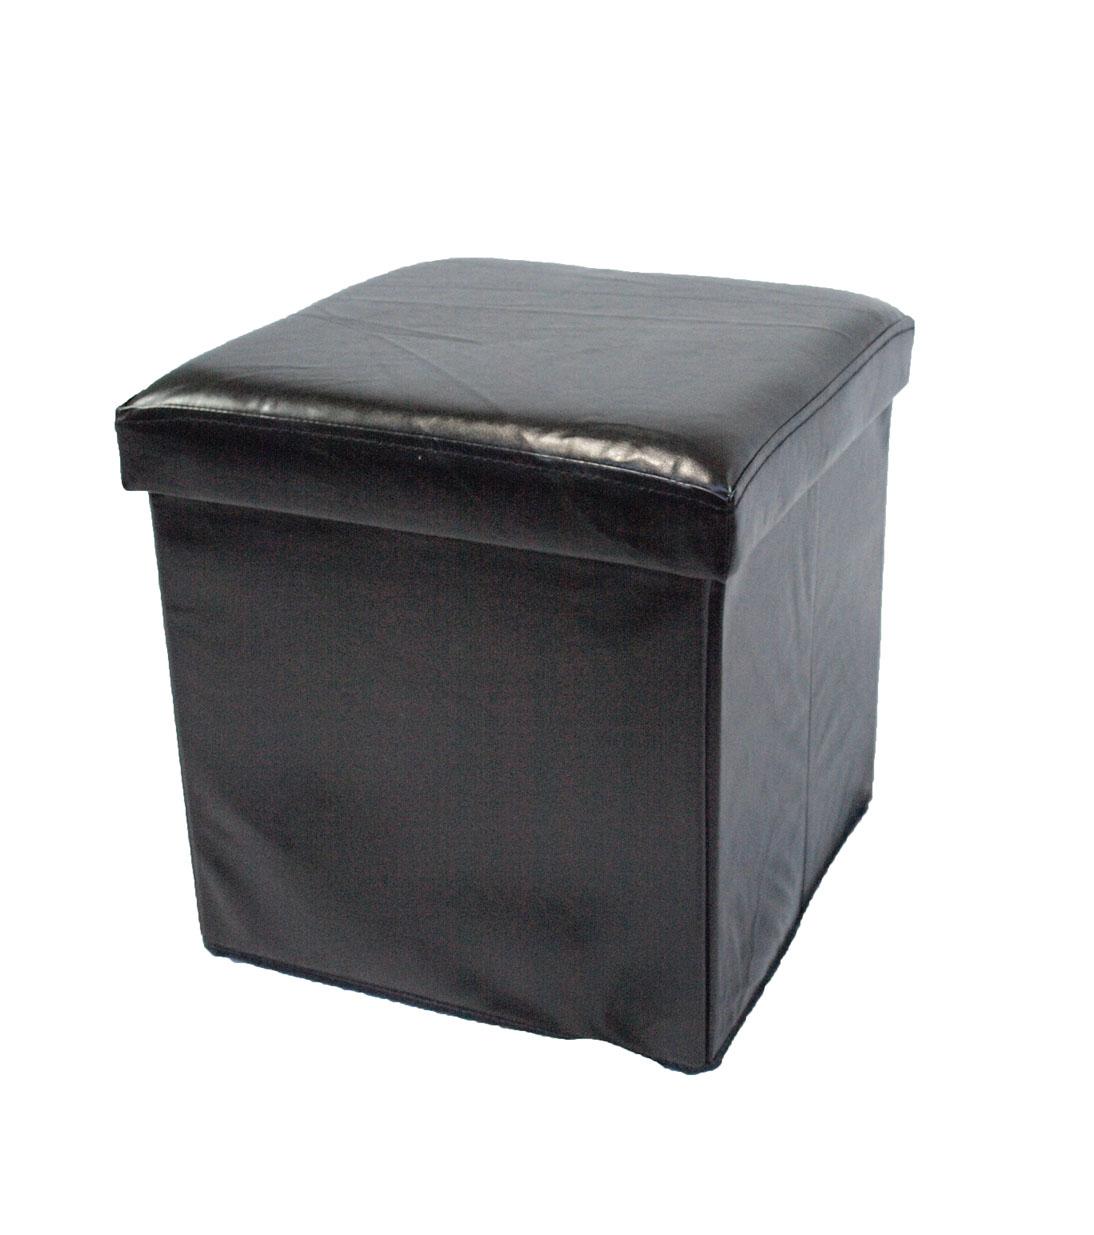 Multi Purpose Faux Leather Folding Ottoman Storage Box/Chair In Black